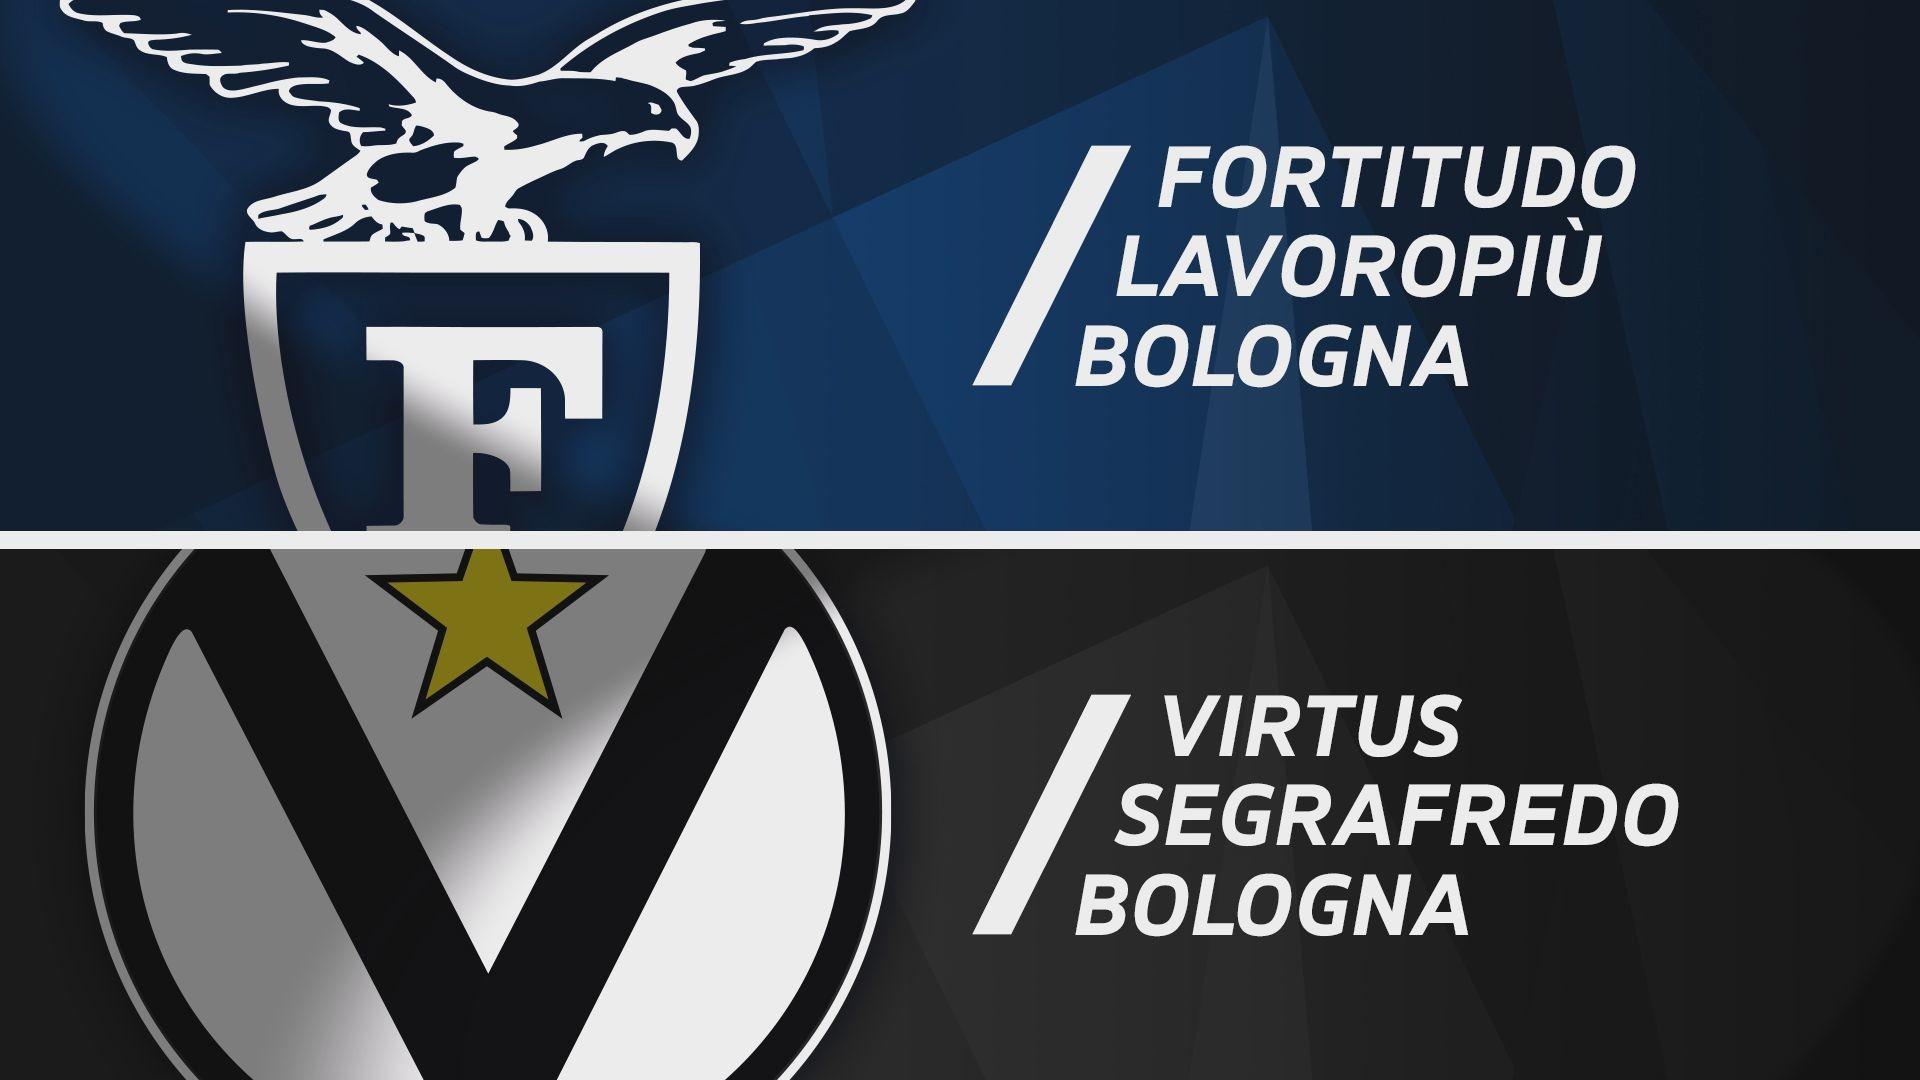 Fortitudo Lavoropiù Bologna - Virtus Segafredo Bologna 71-91